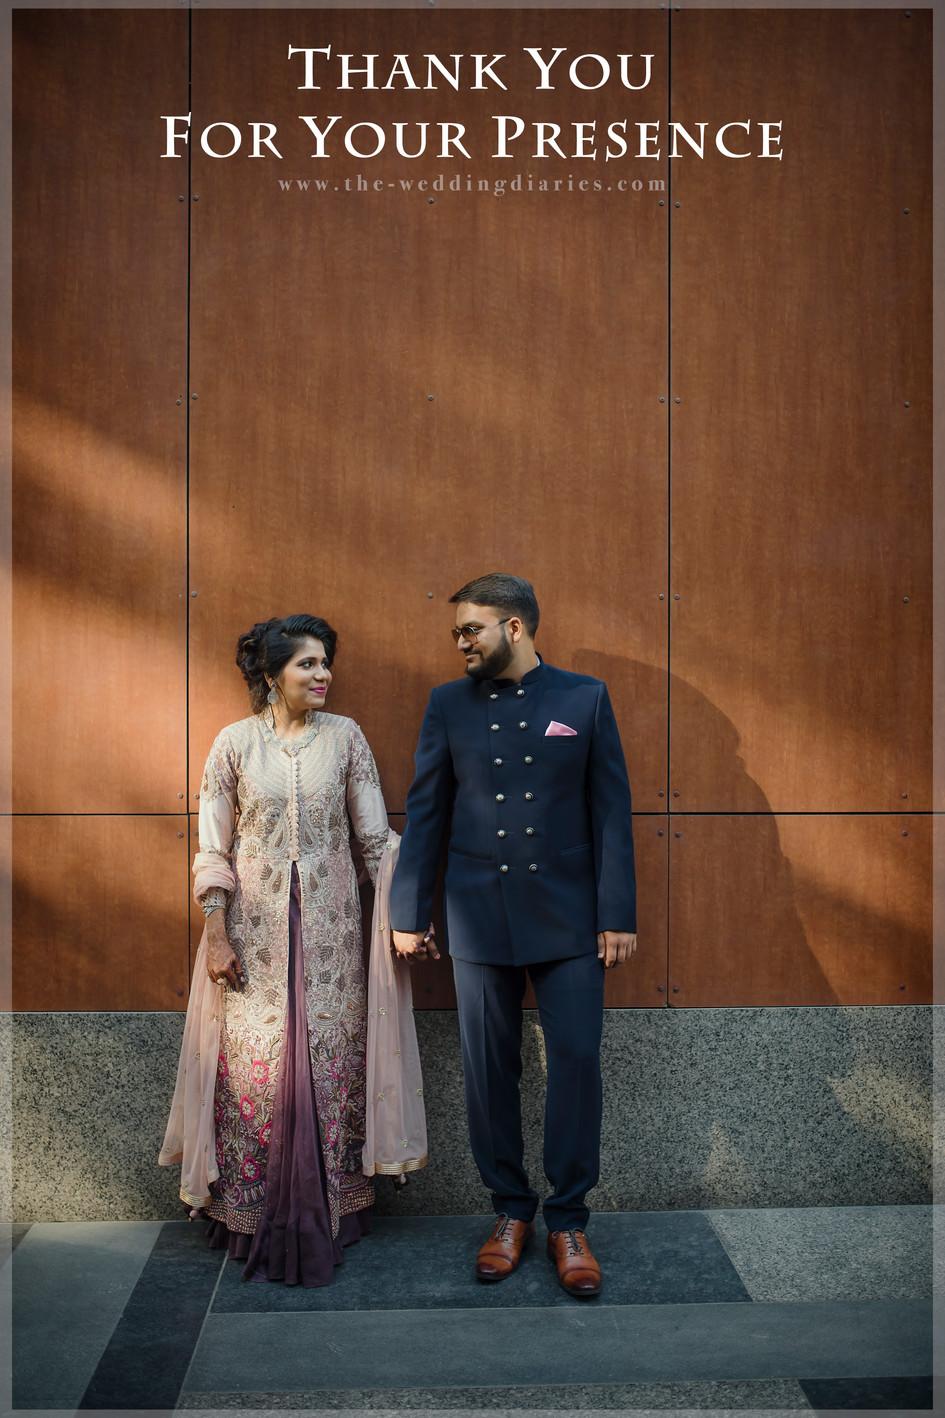 The Wedding Diaries - Roka shoot of Tushar and Kanika